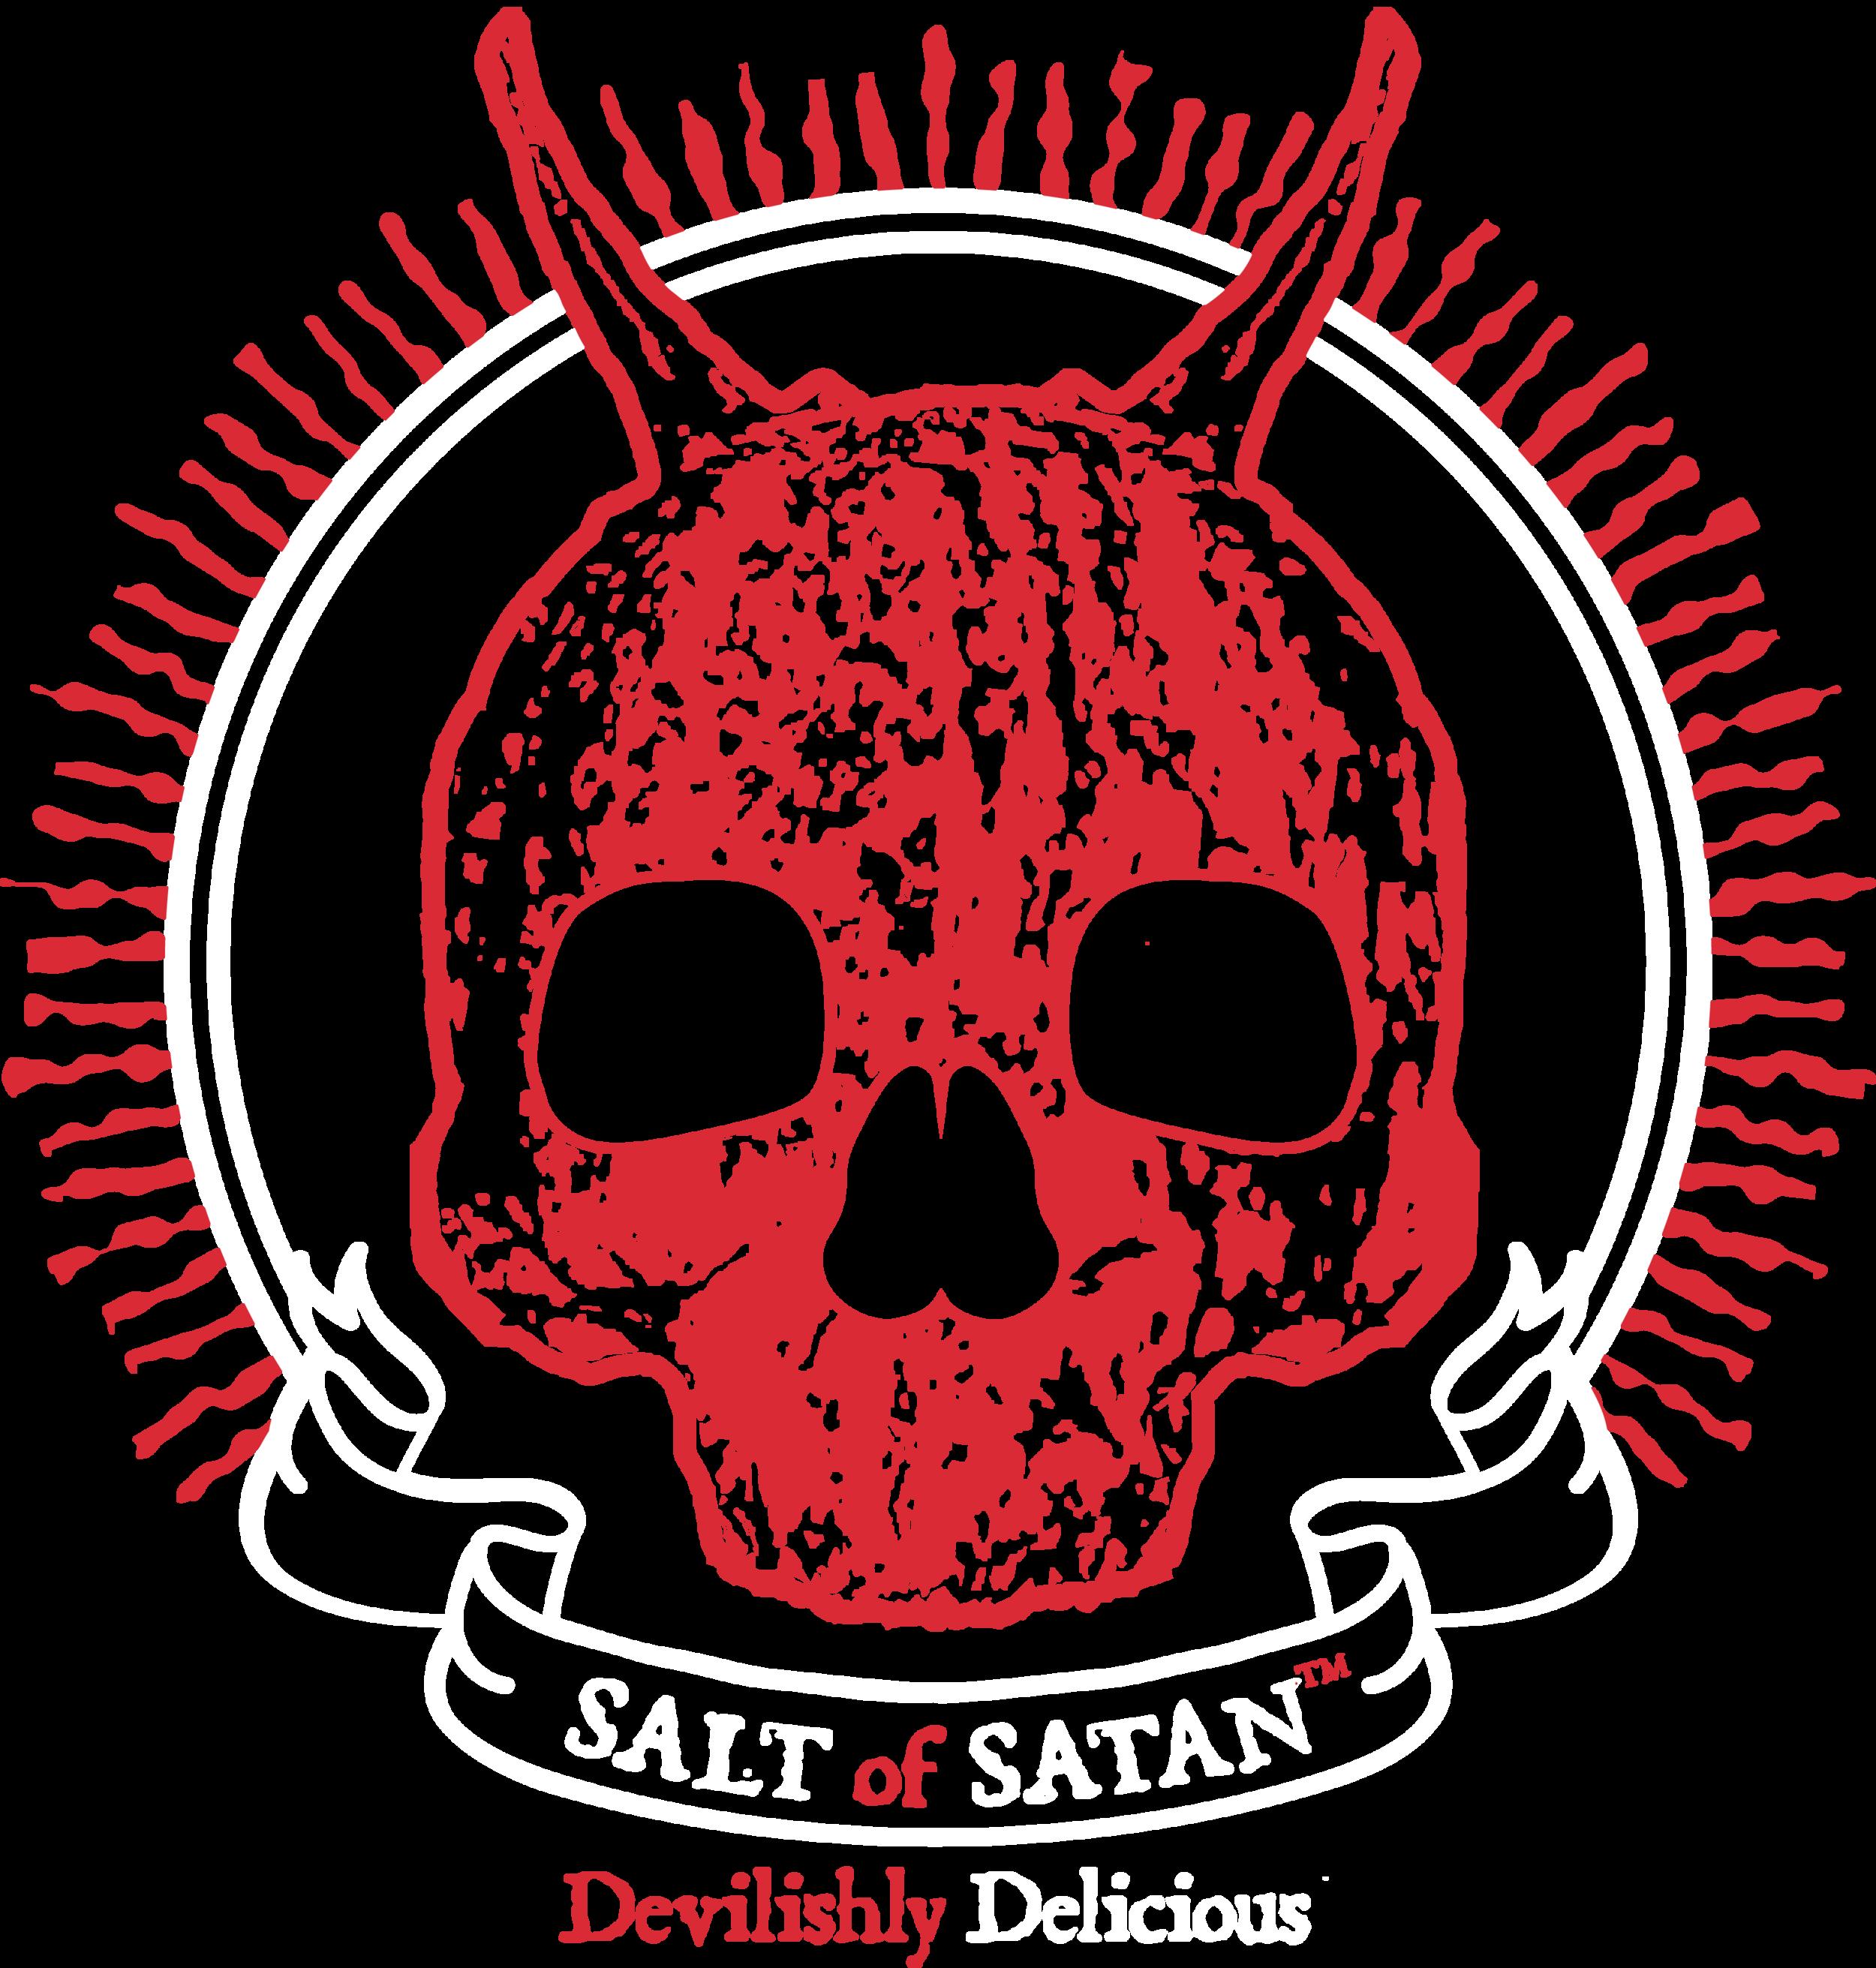 "SALT of SATAN<strong>NAMING & LOGO DESIGN, BRAND POSITIONING, PRODUCT DEVELOPMENT </strong><a href=""/salt-of-satan"">More</a>"